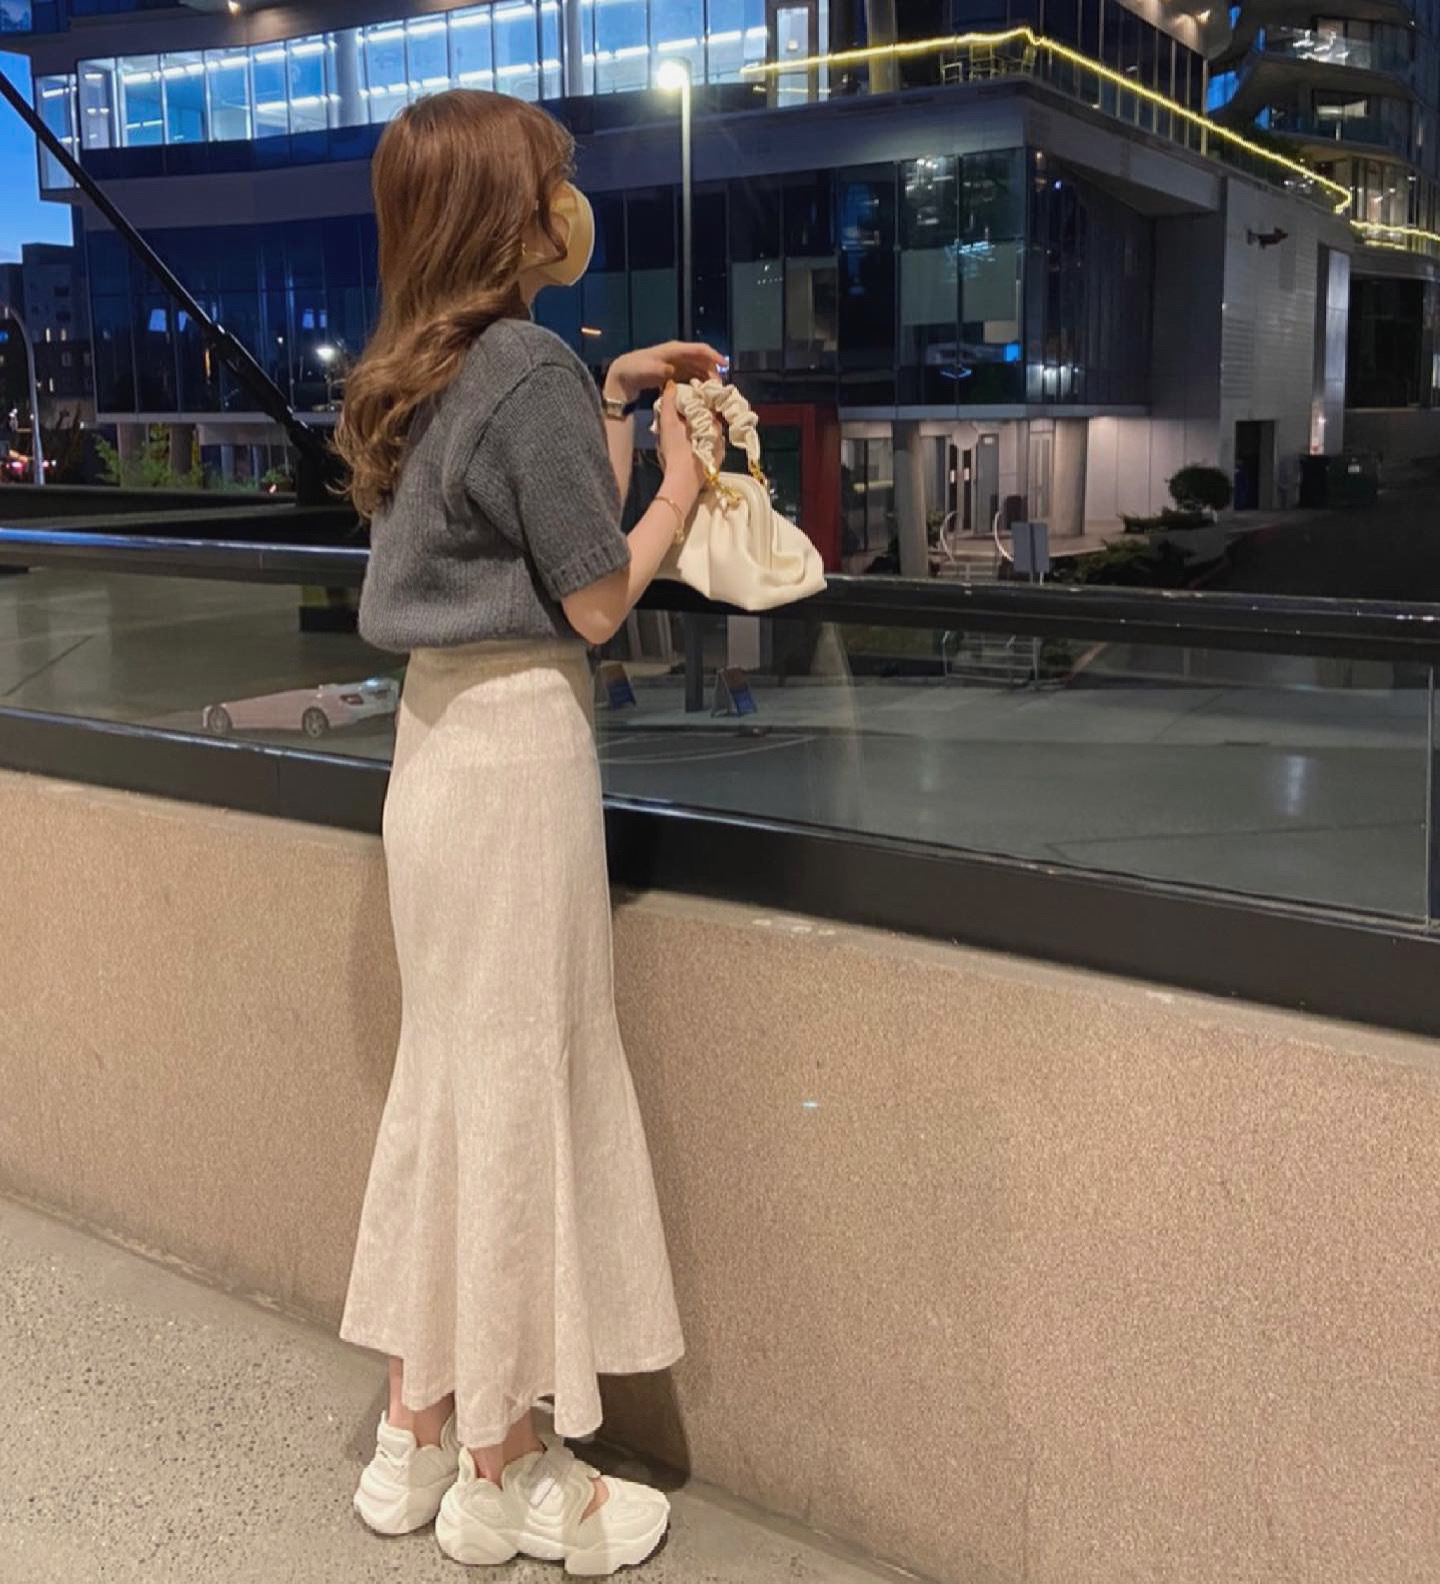 【RE】DAYNYC bottleneck half sleeve knit (charcoal)